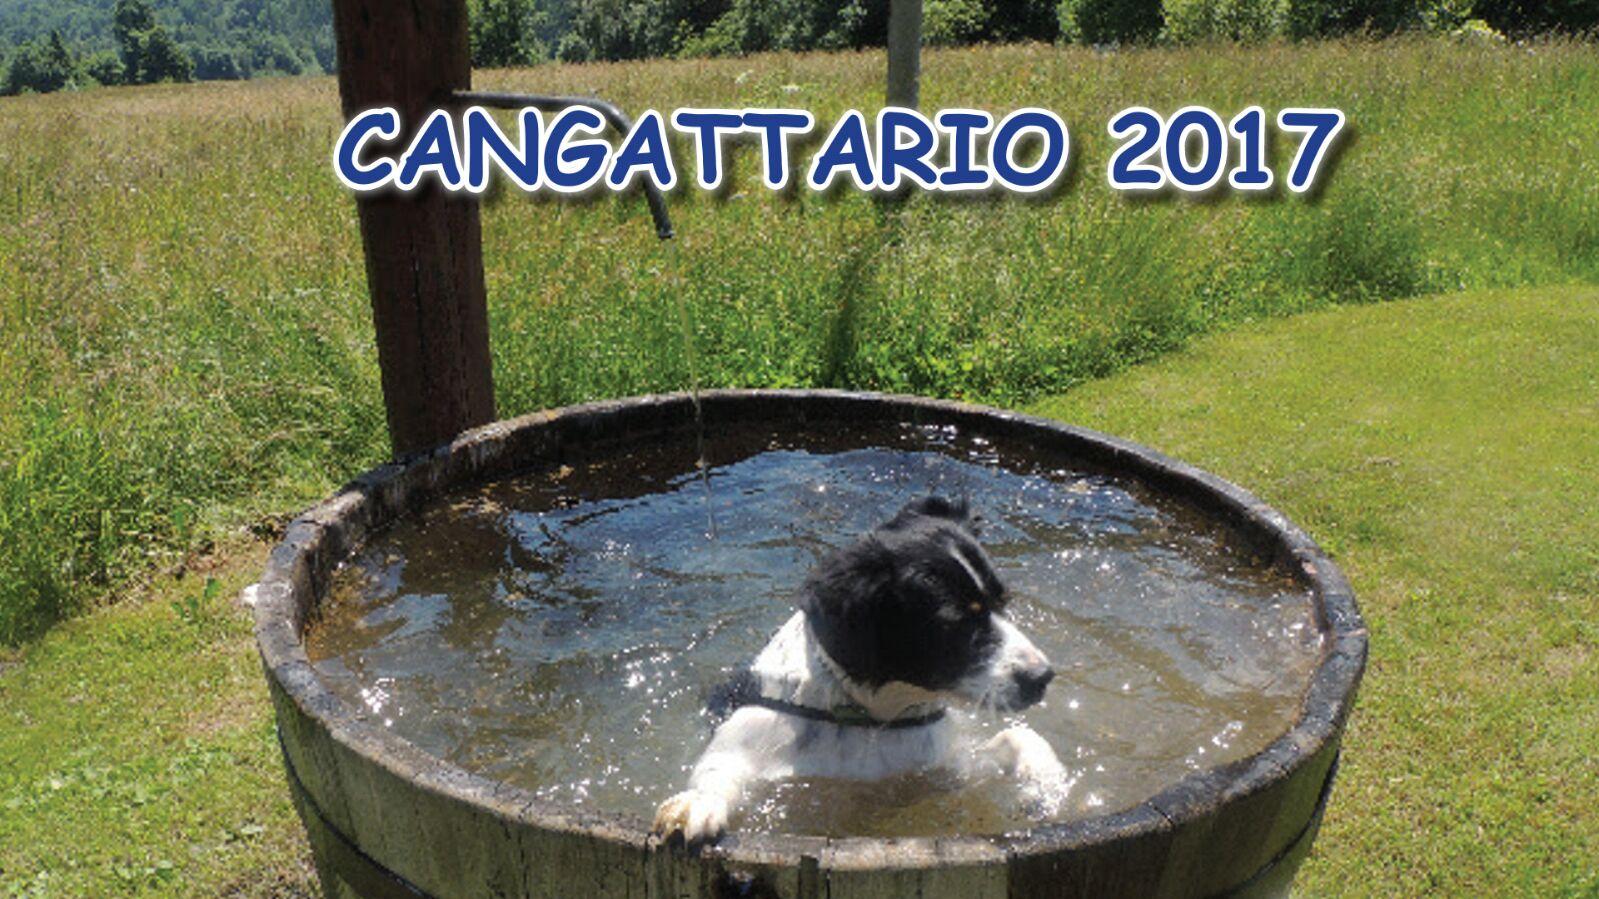 CANGATTARIO 2017